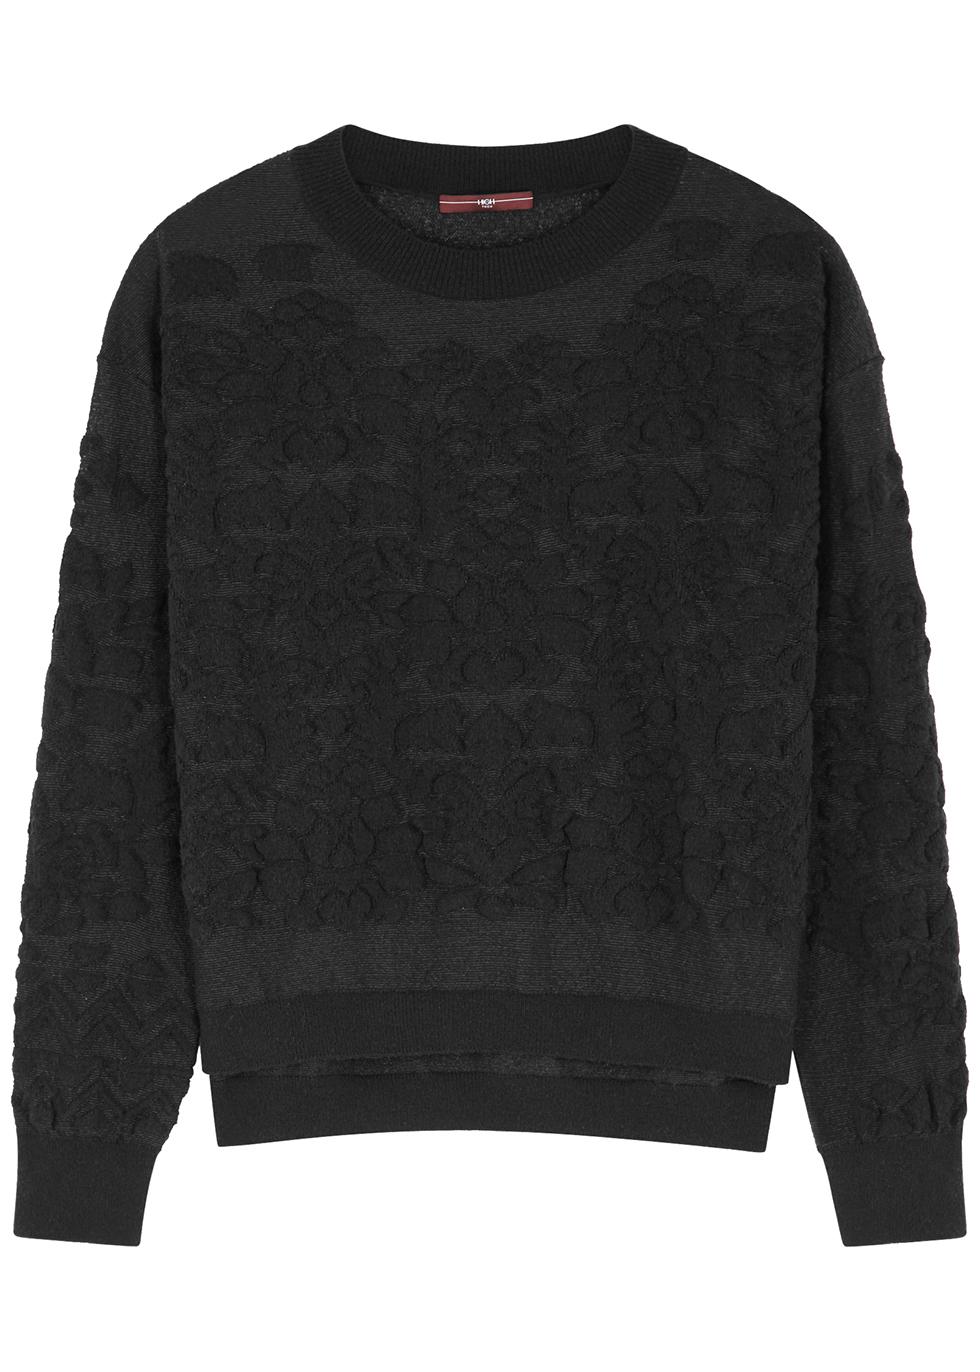 Counteract black textured jumper